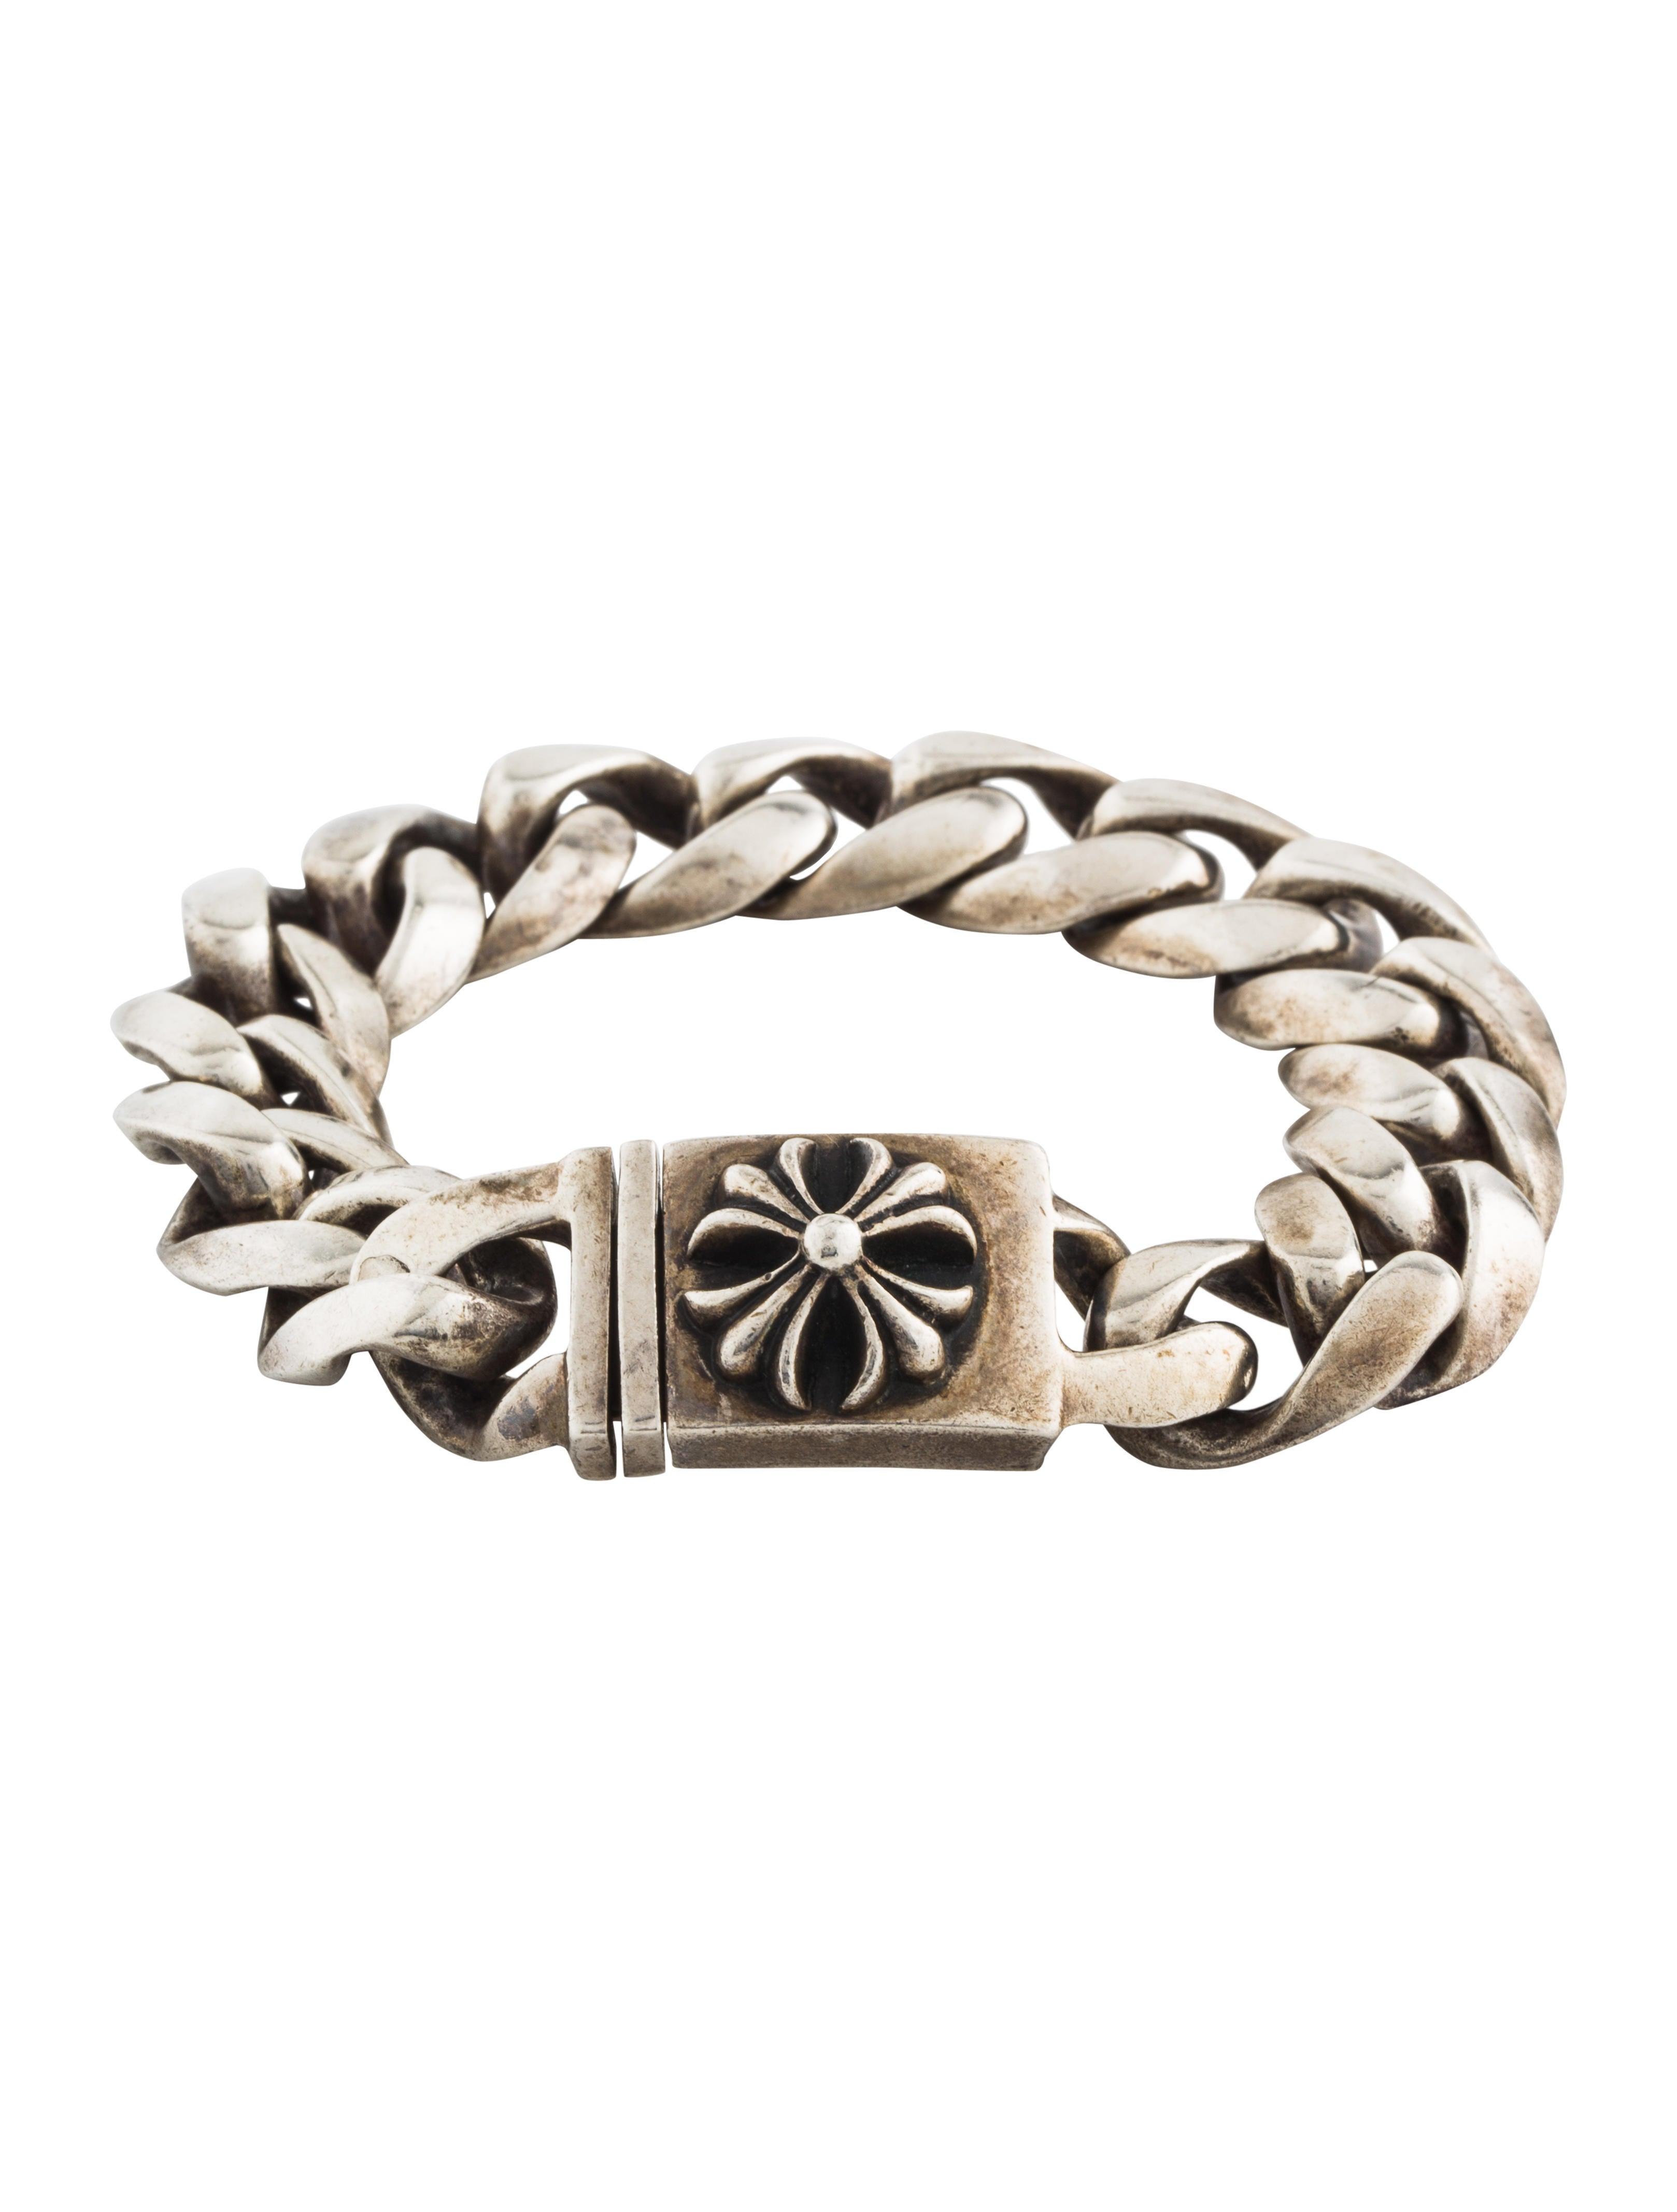 b6aa912854dc Chrome Hearts Cross ID Chain Bracelet - Bracelets - CHH24623